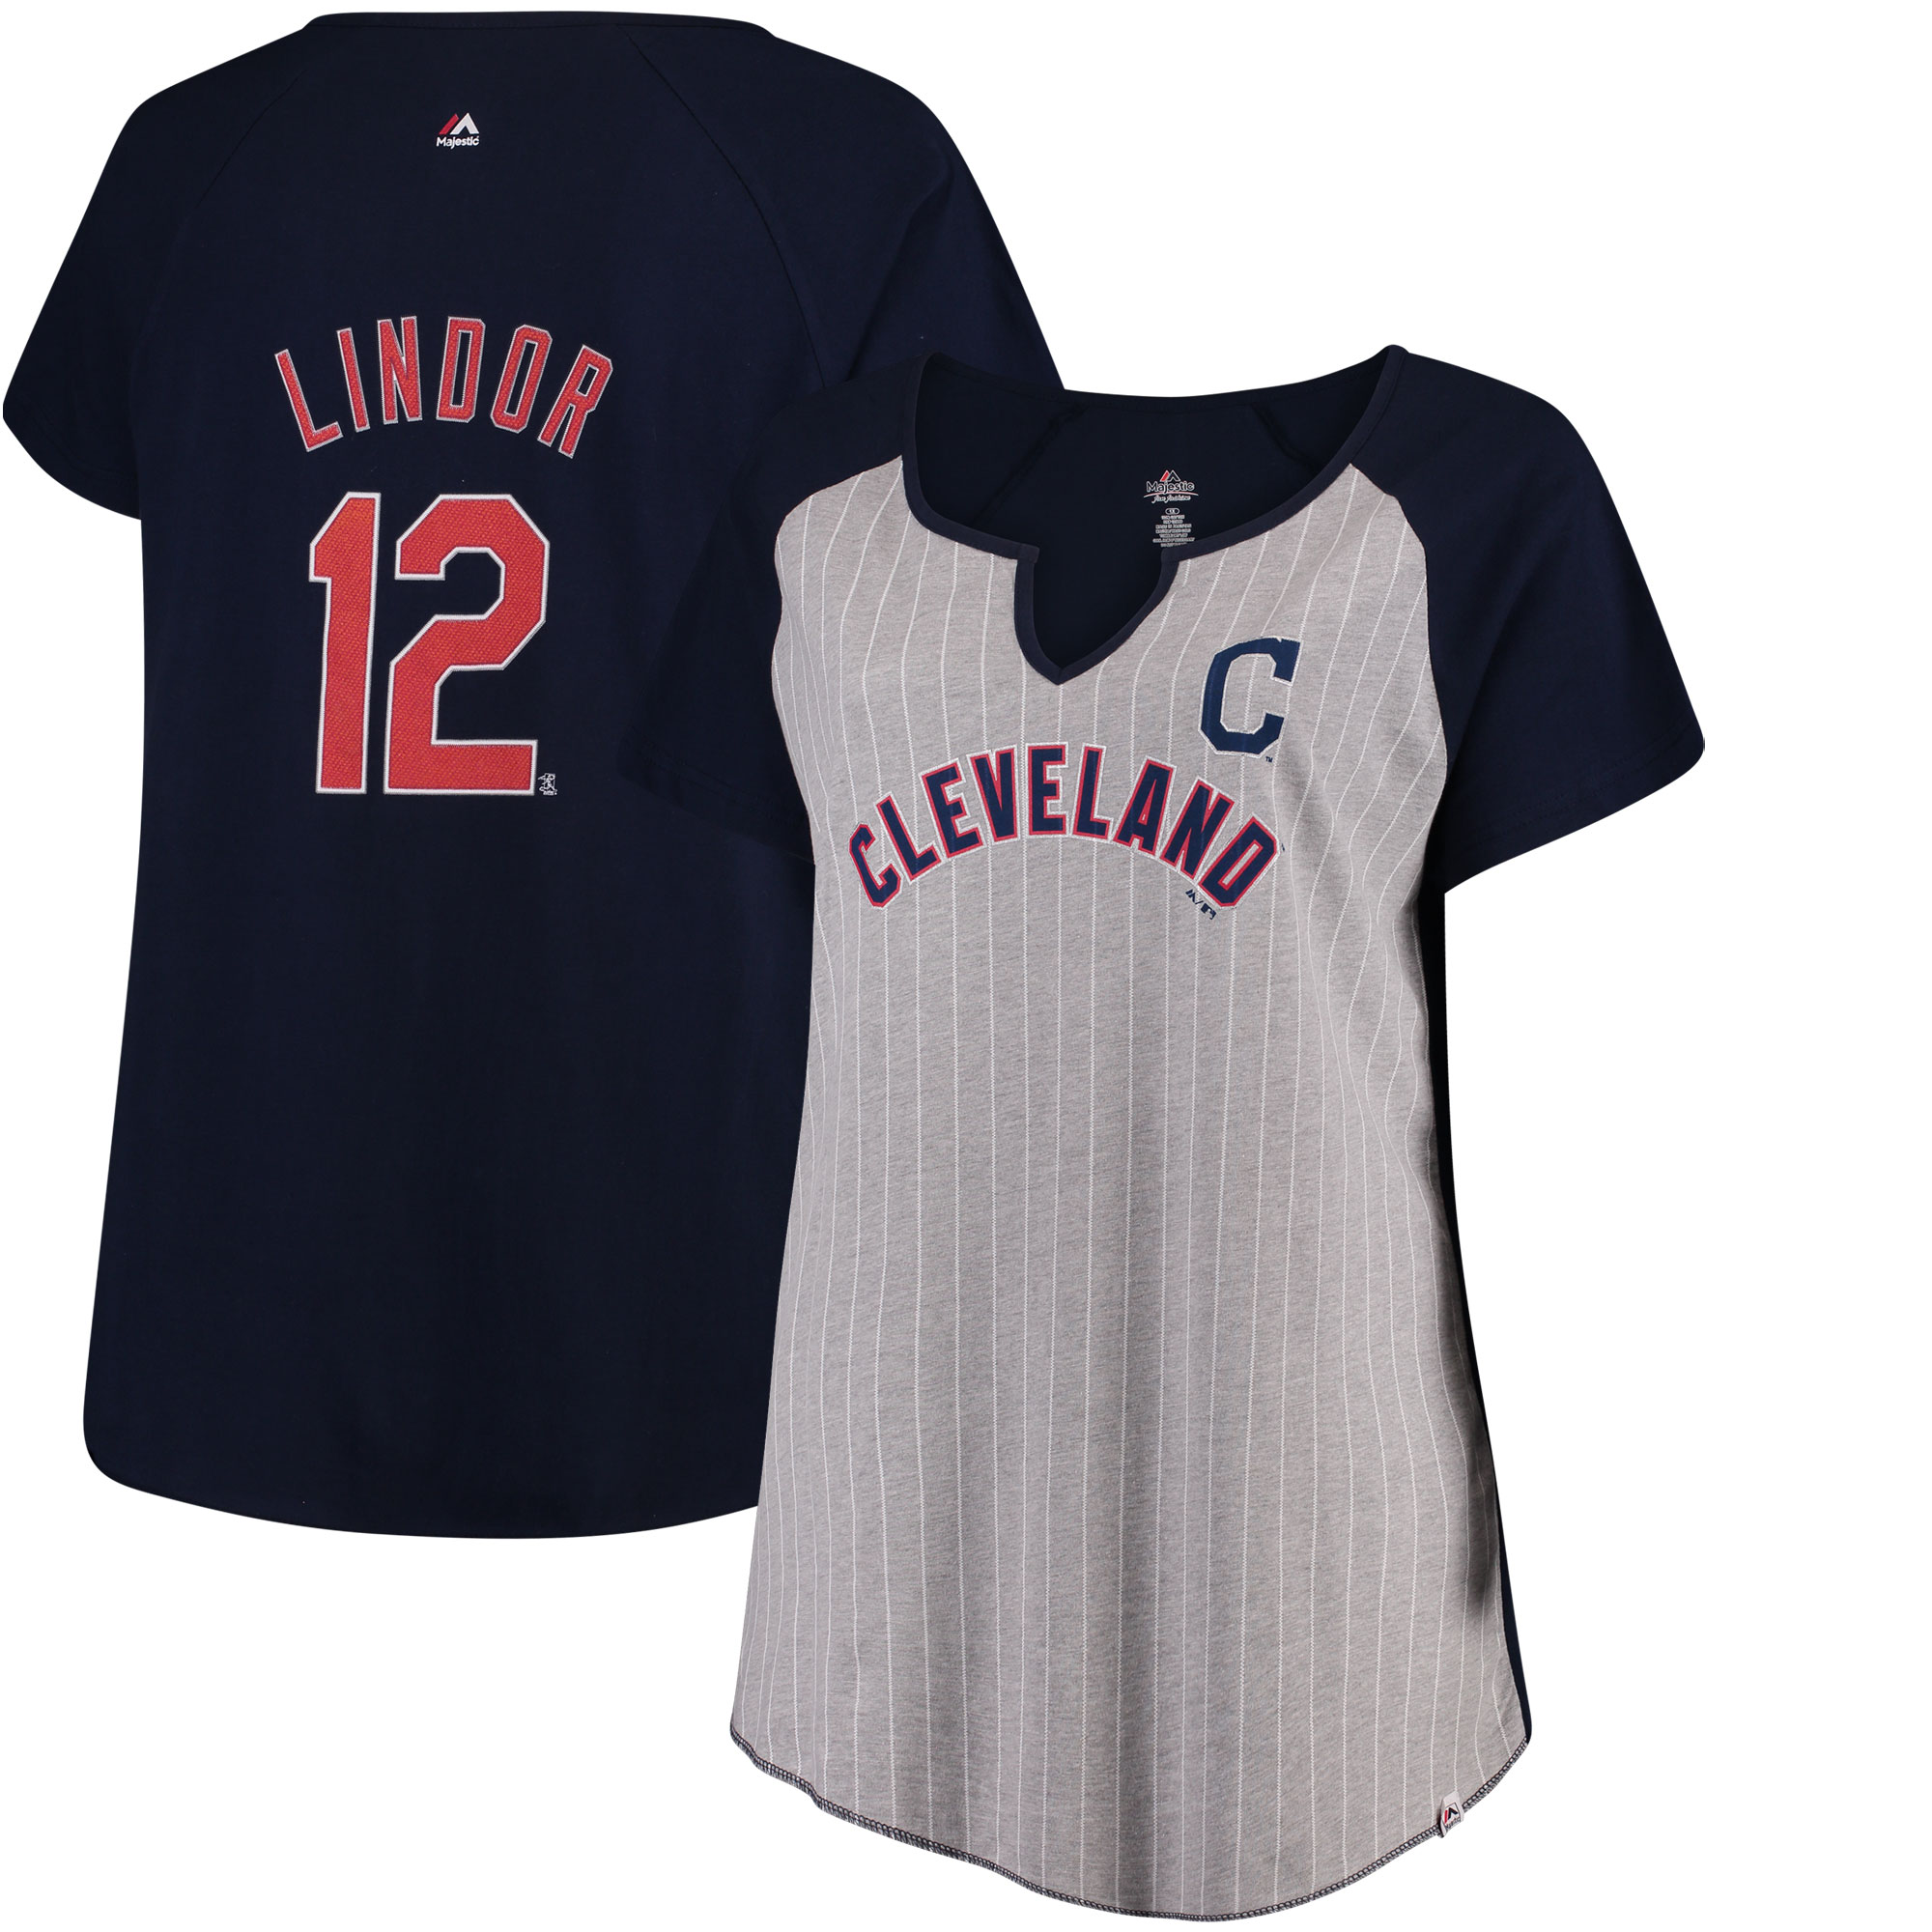 Francisco Lindor Cleveland Indians Majestic Women's Plus Size Pinstripe Player V-Notch T-Shirt - Gray/Navy